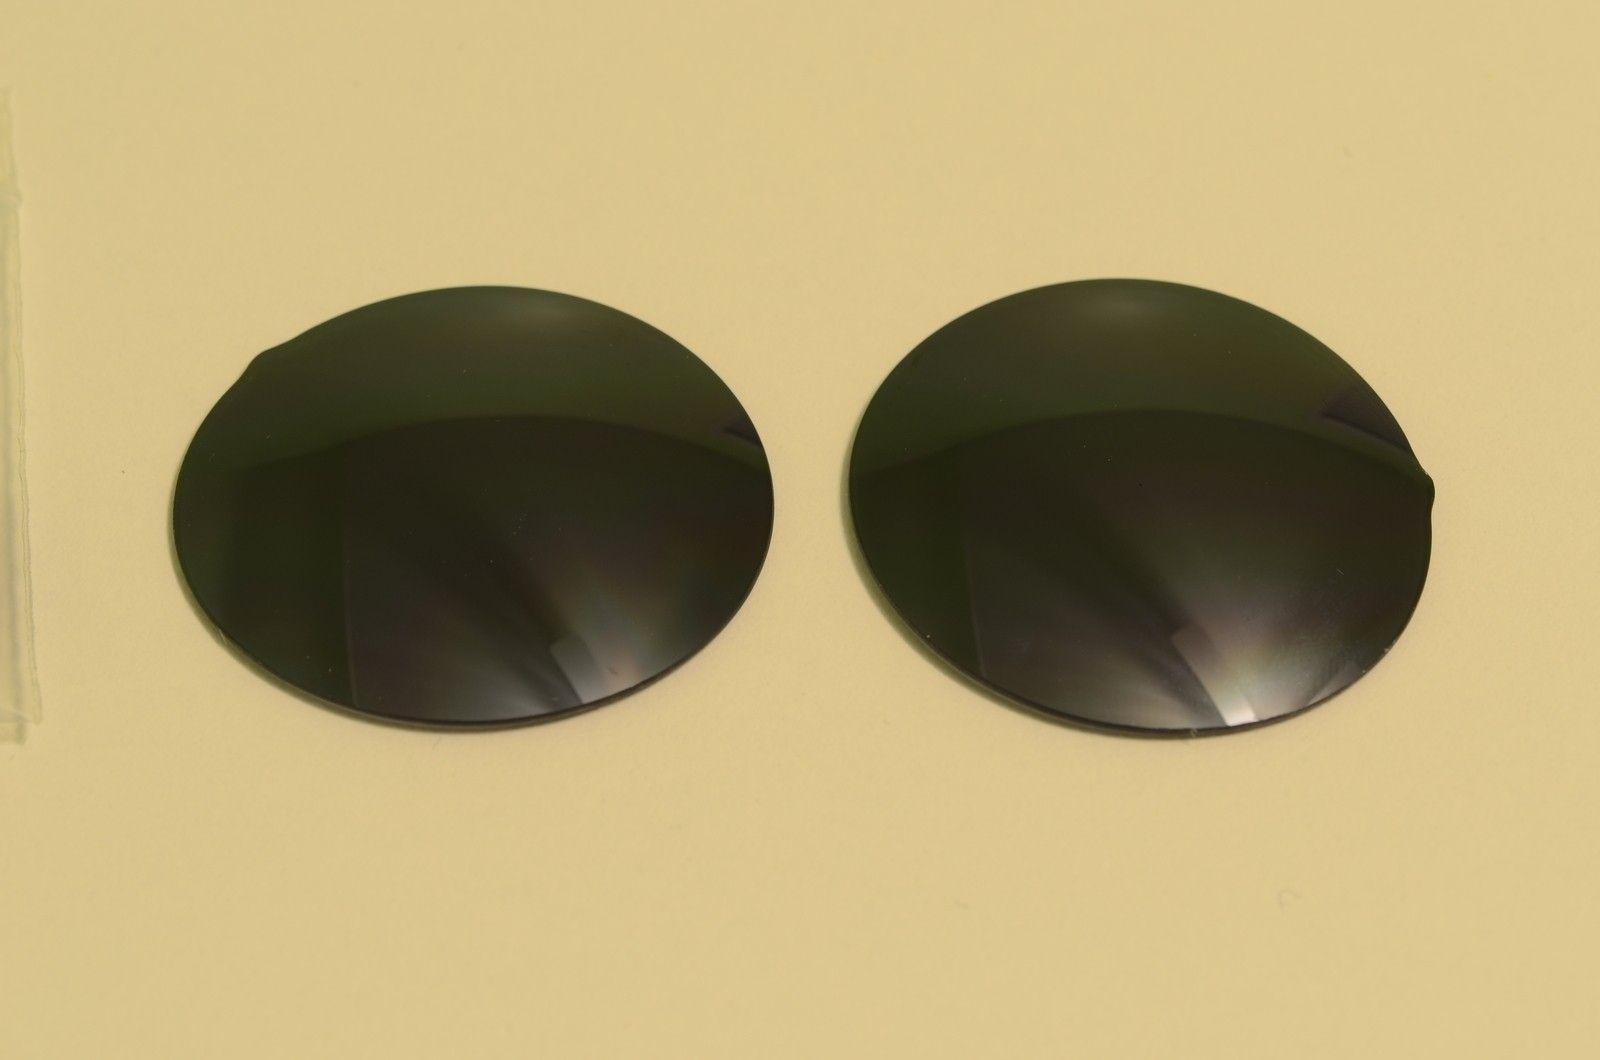 X Metal Mars Crater - Black Iridium and Fire Iridium lenses - DSC_0487.JPG